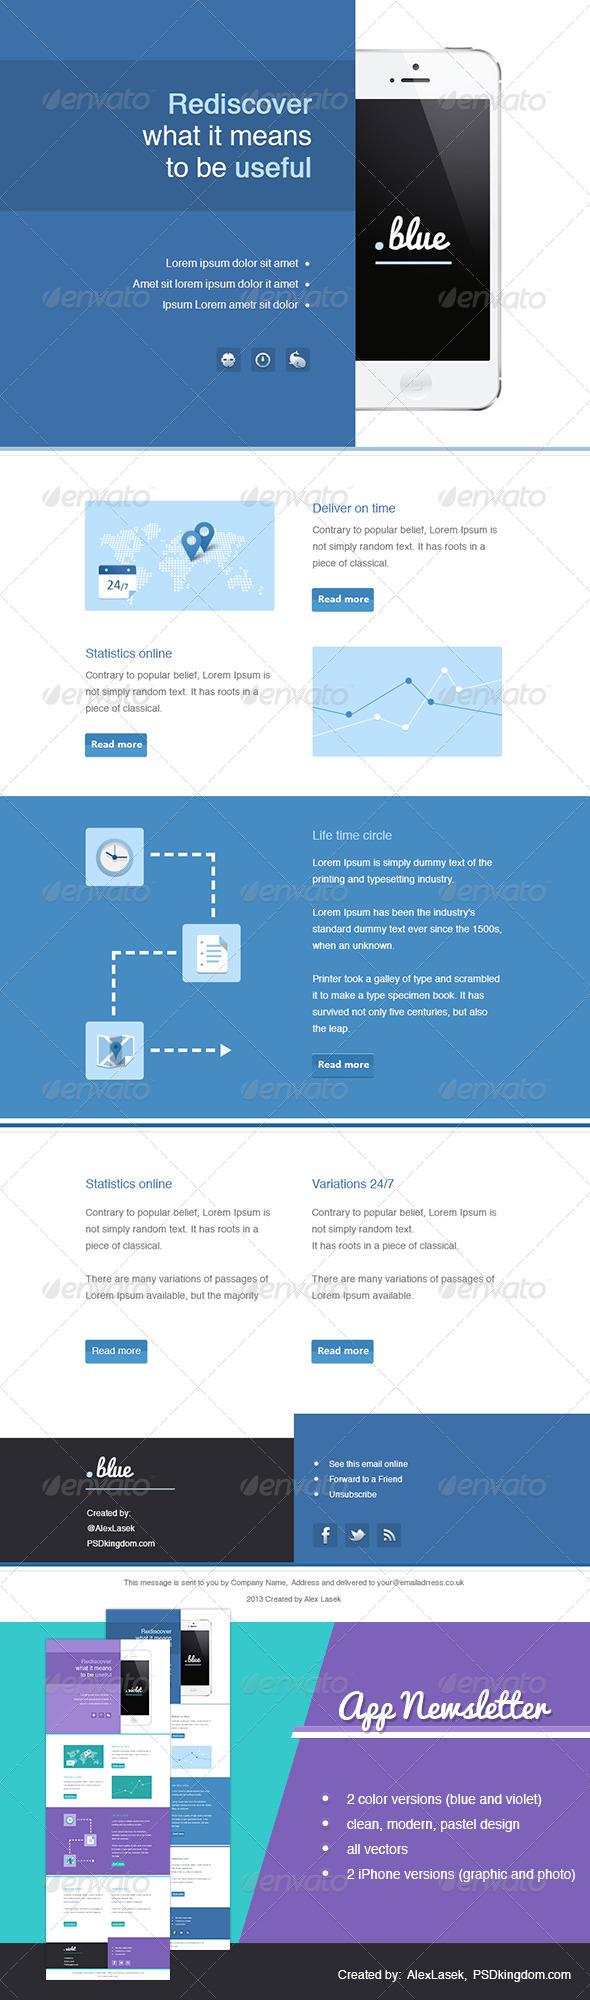 GraphicRiver App eNewsletter Templates Blue & Violet 4616830